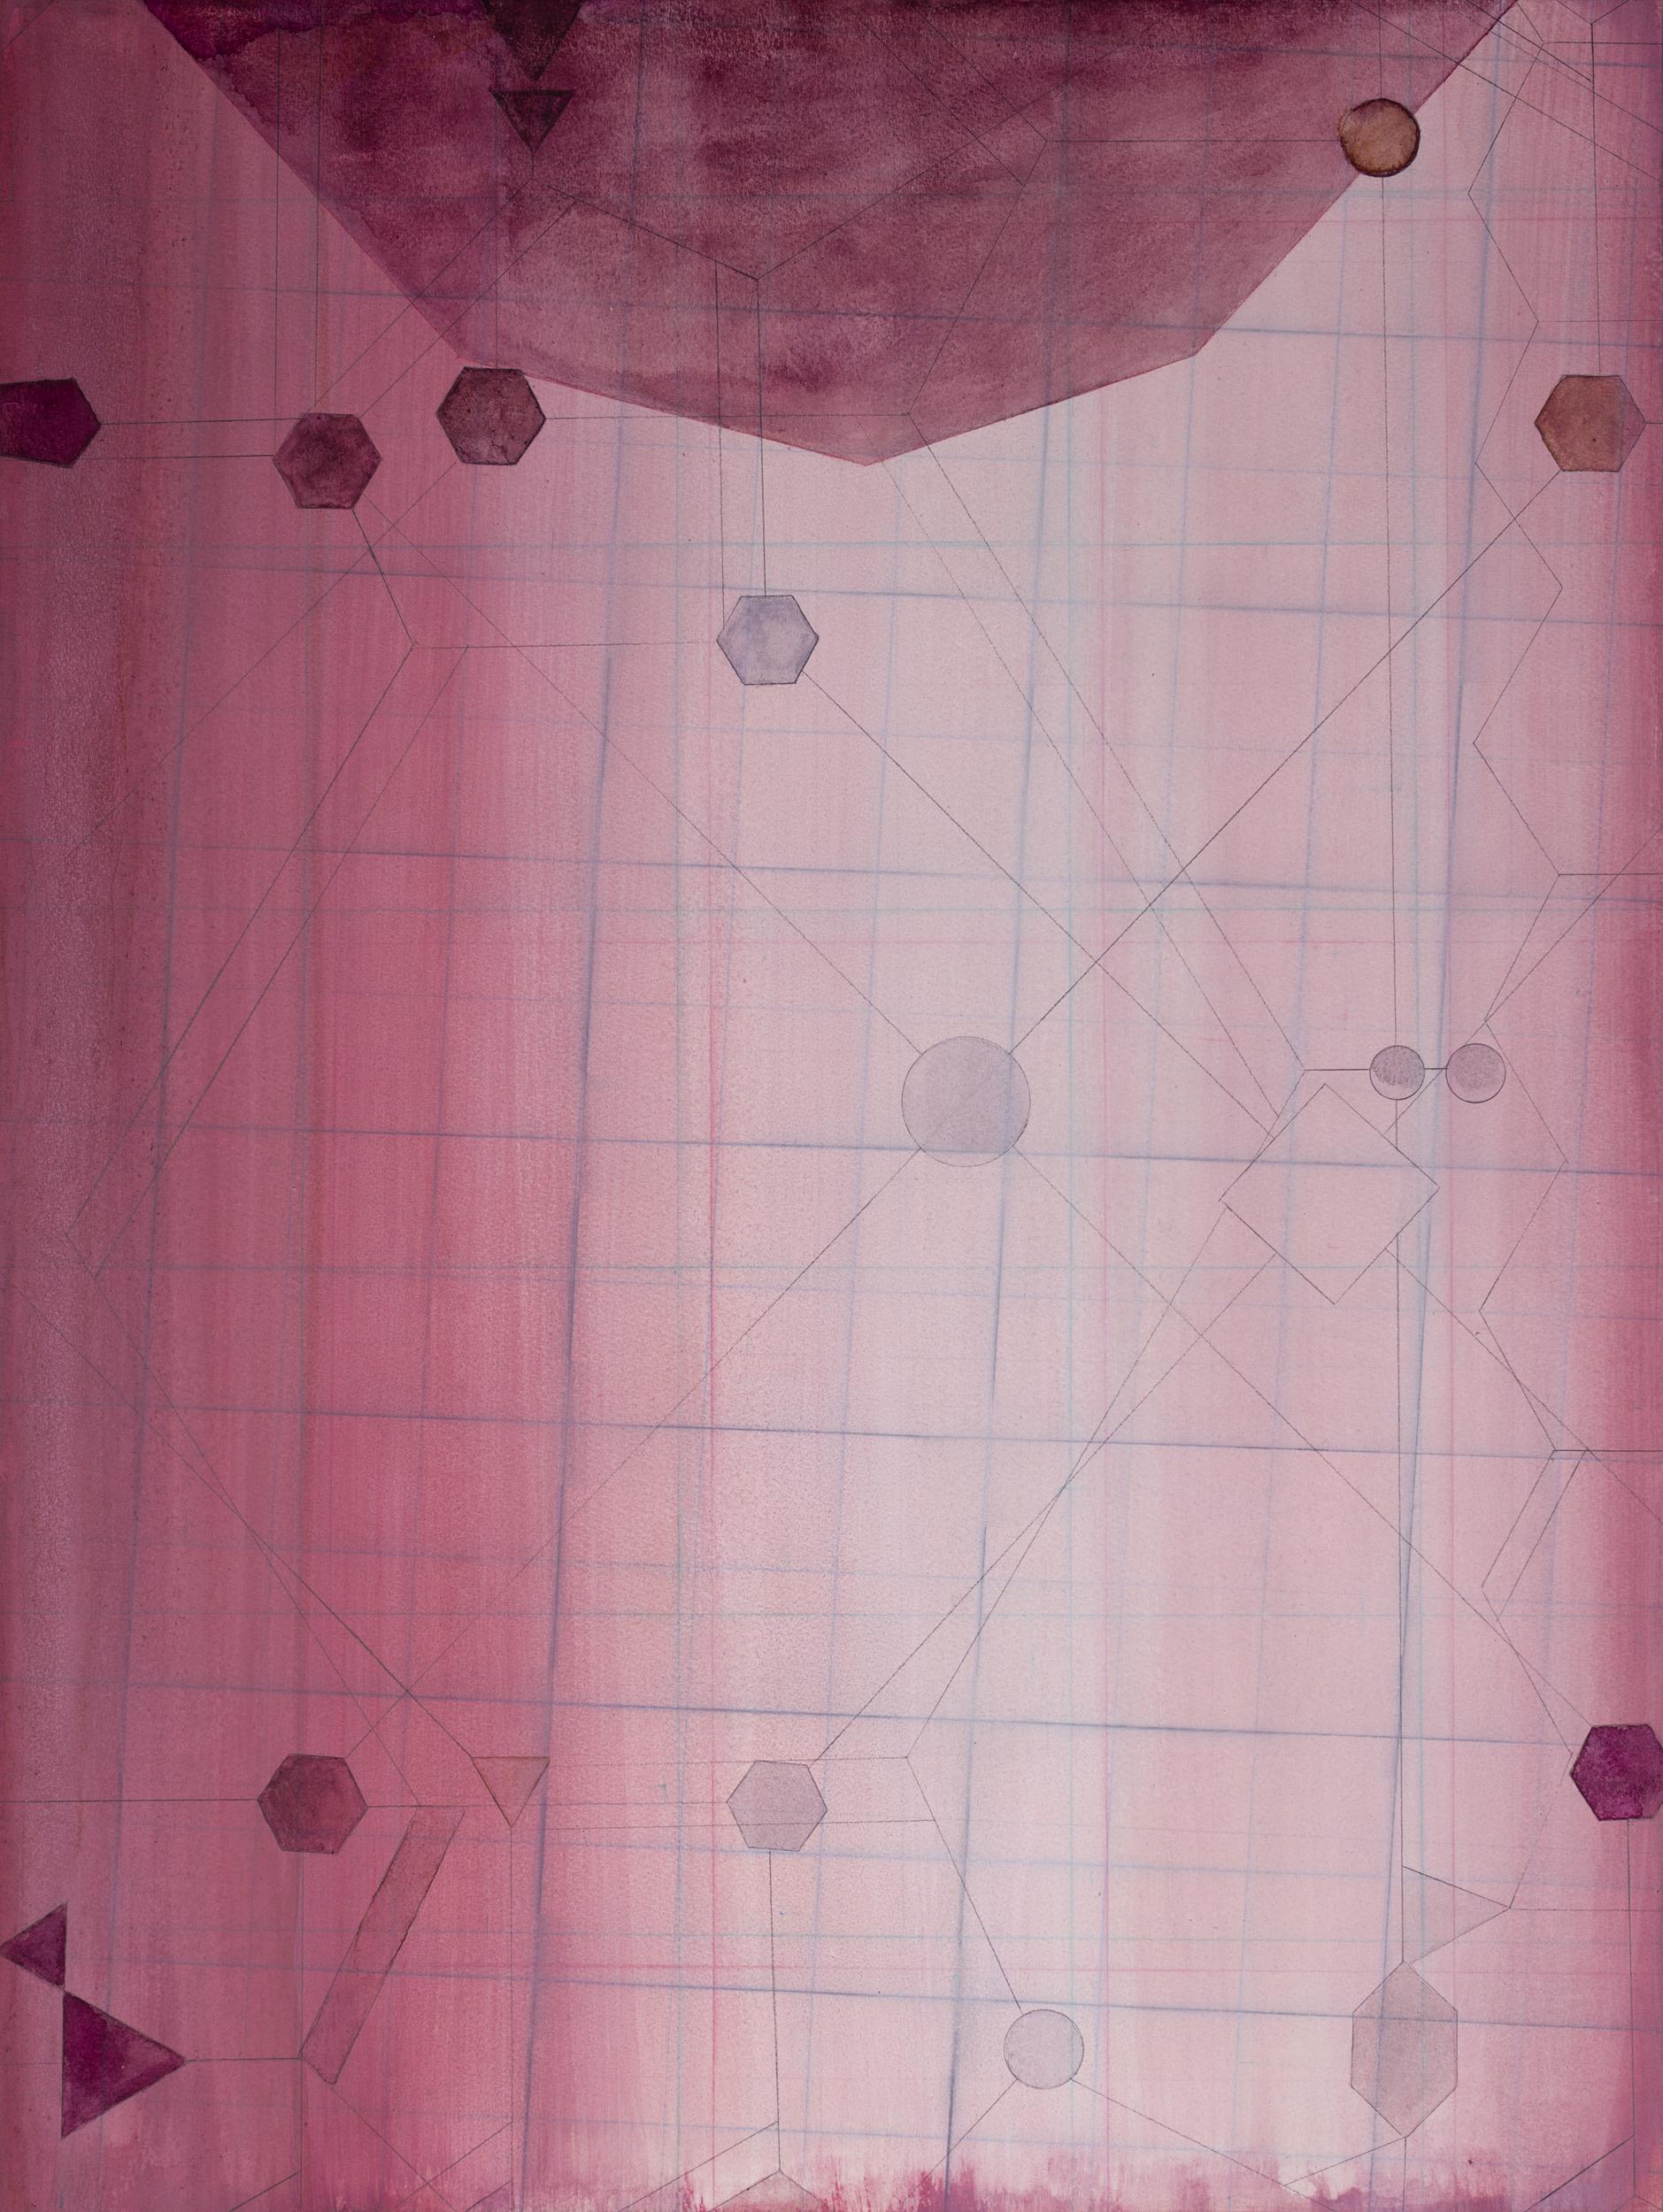 Christine Ödlund   Molekyl  2018 Plant pigment, tempera, and mixed binder on paper 71,9 x 53,8 cm